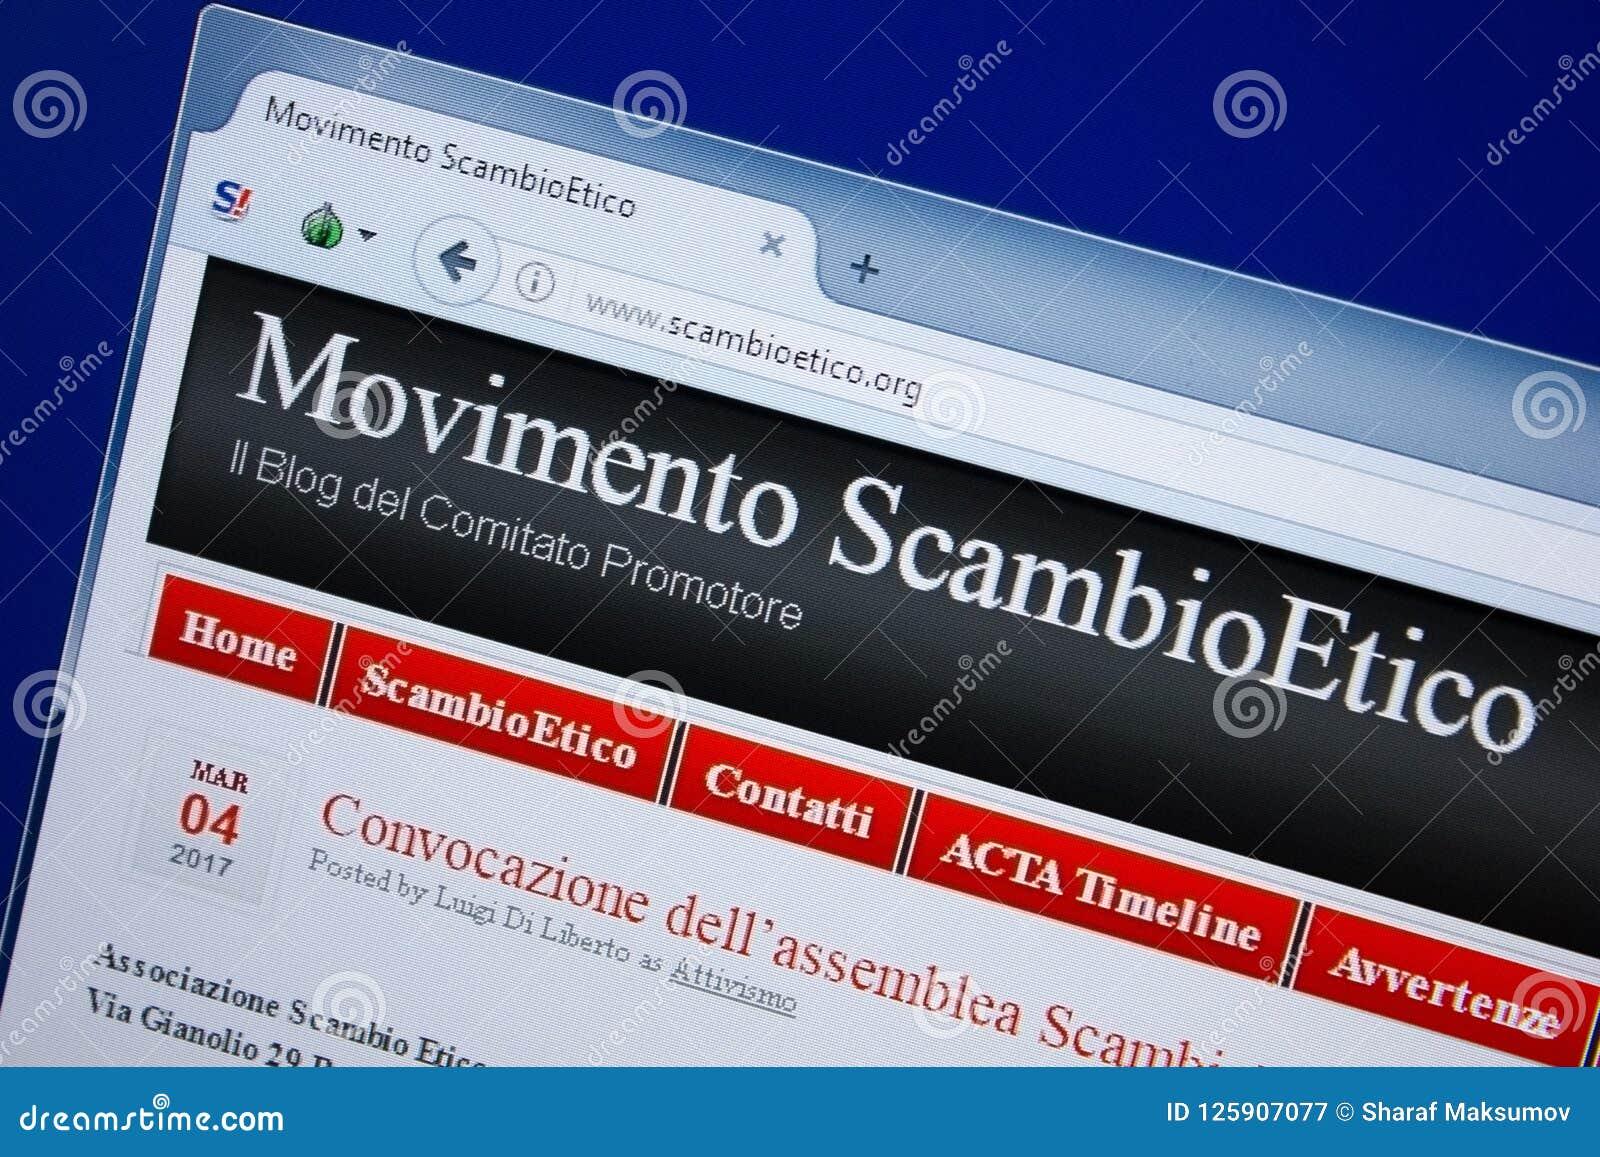 Ryazan, Ρωσία - 9 Σεπτεμβρίου 2018: Αρχική σελίδα του ιστοχώρου Scambio Etico στην επίδειξη του PC, url - ScambioEtico org